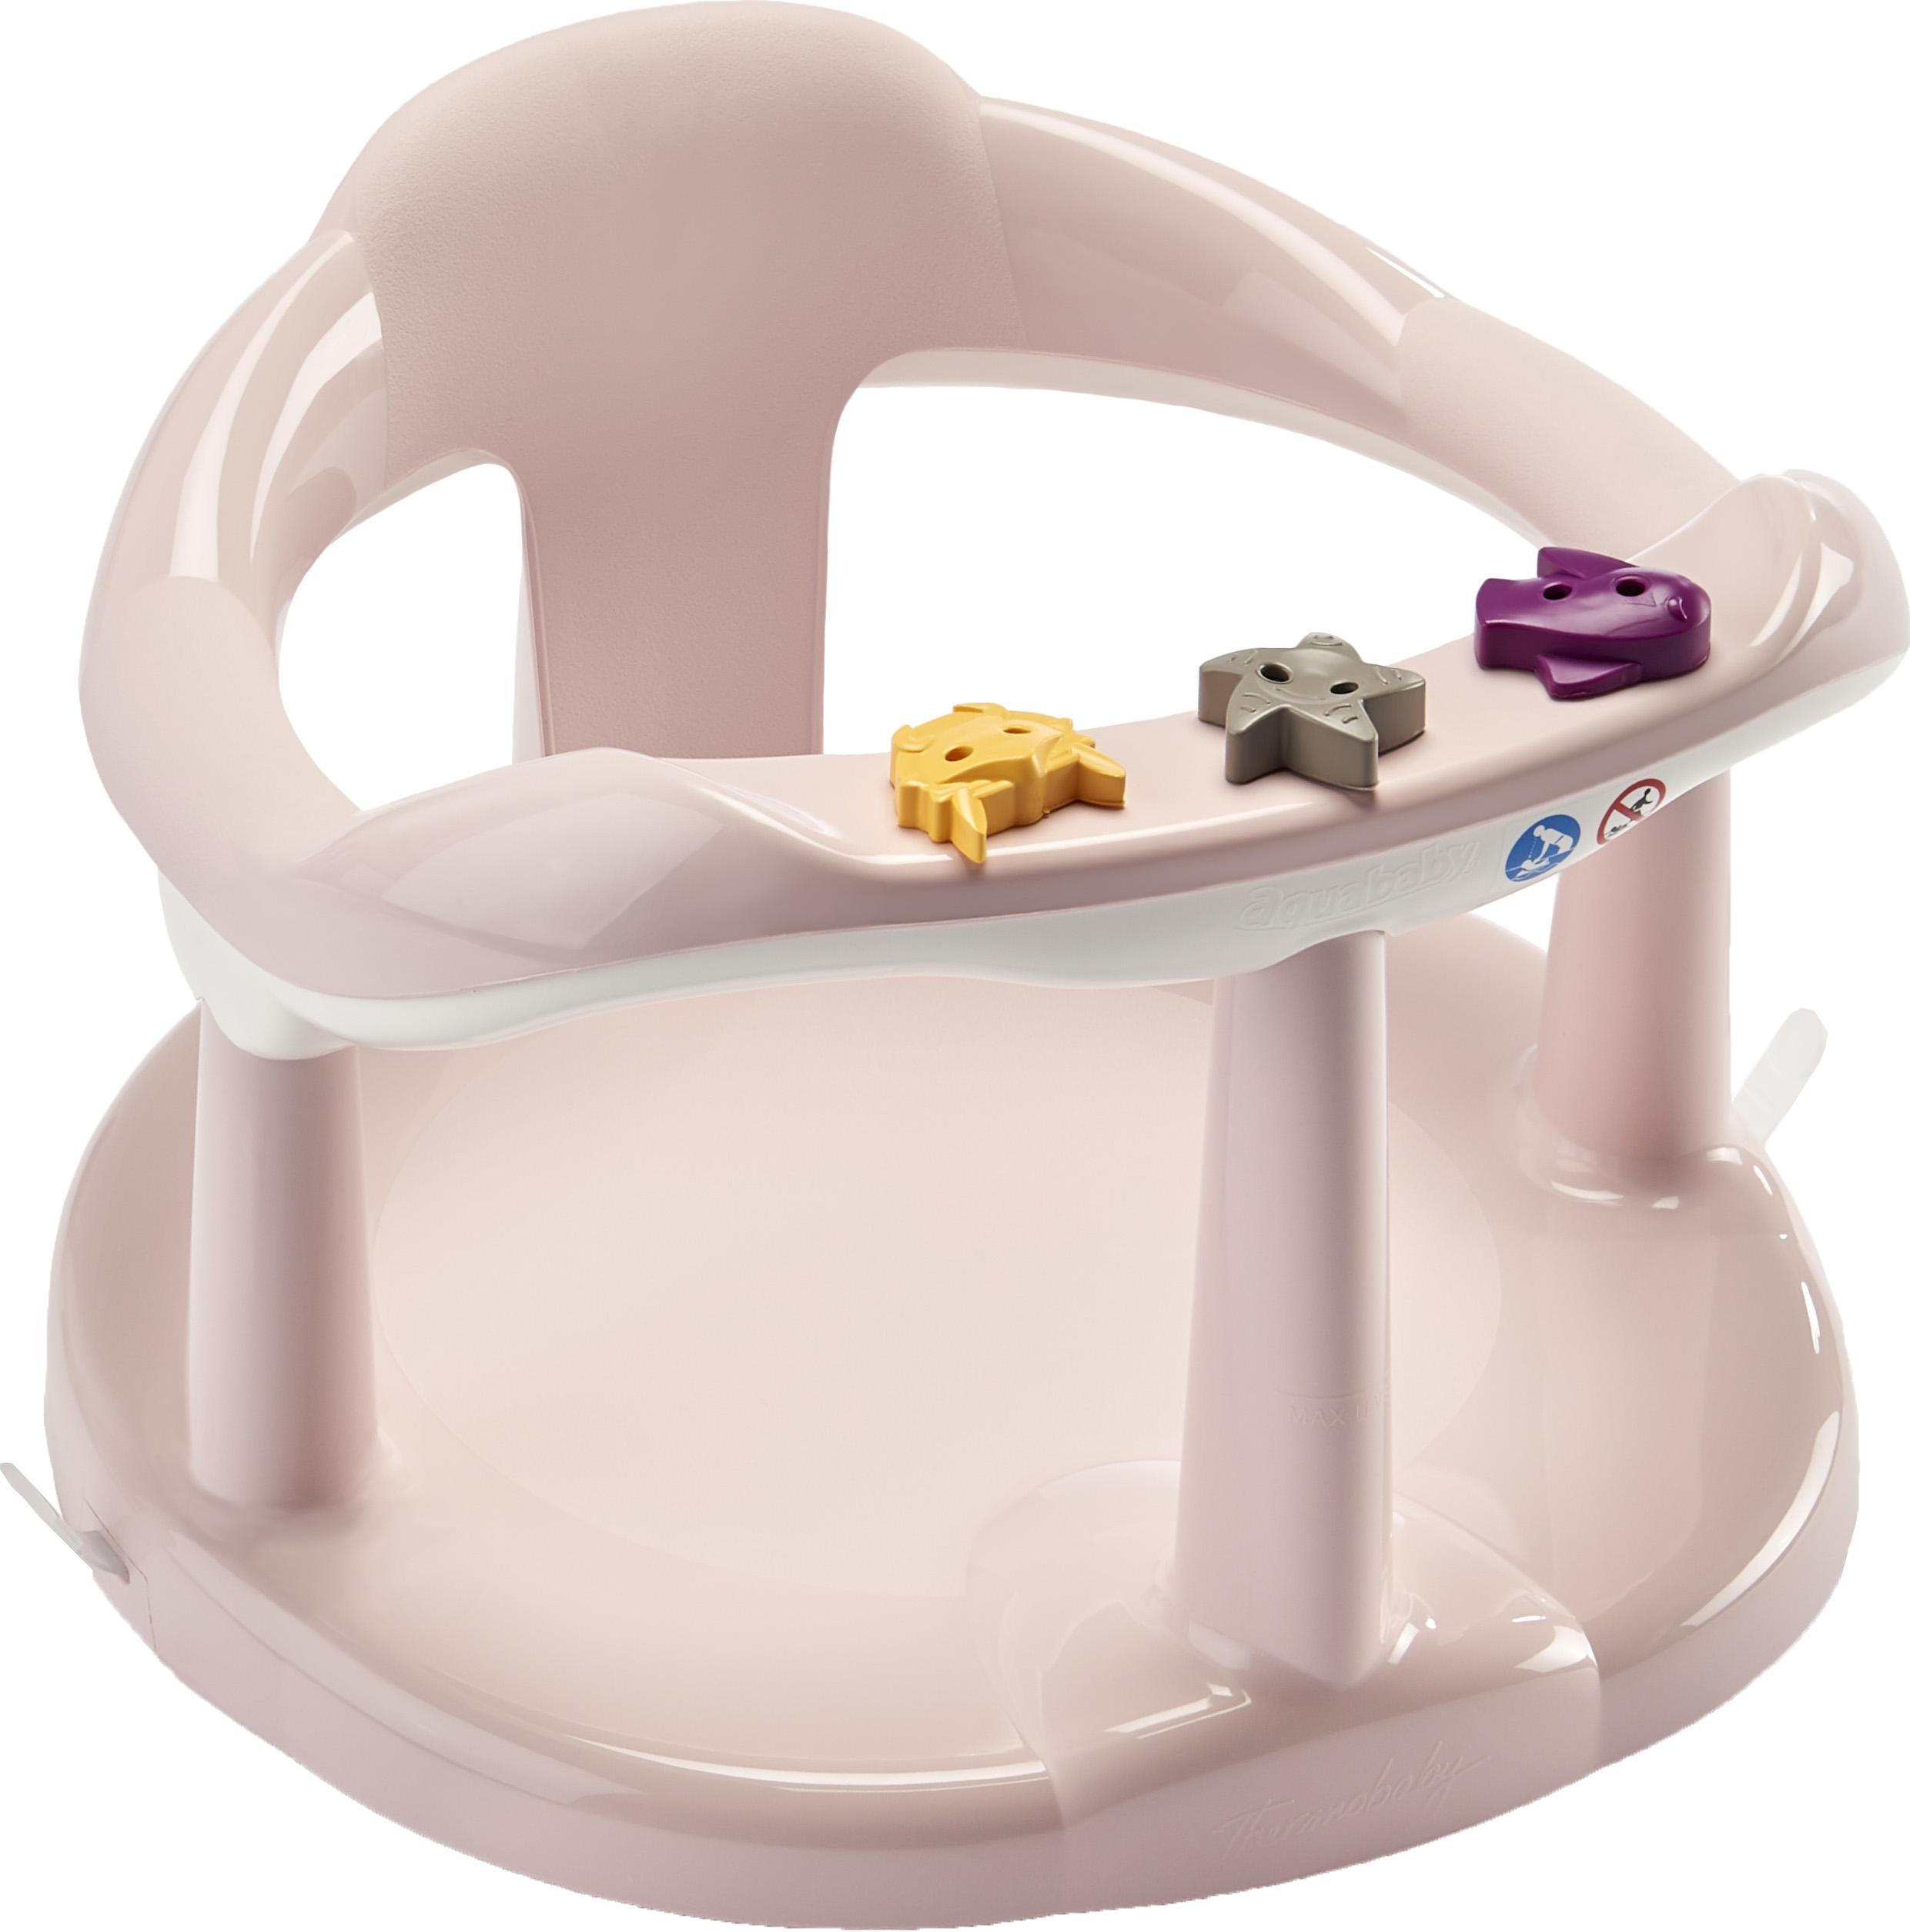 THERMOBABY  Sedátko do vany Aquababy, Powder Pink